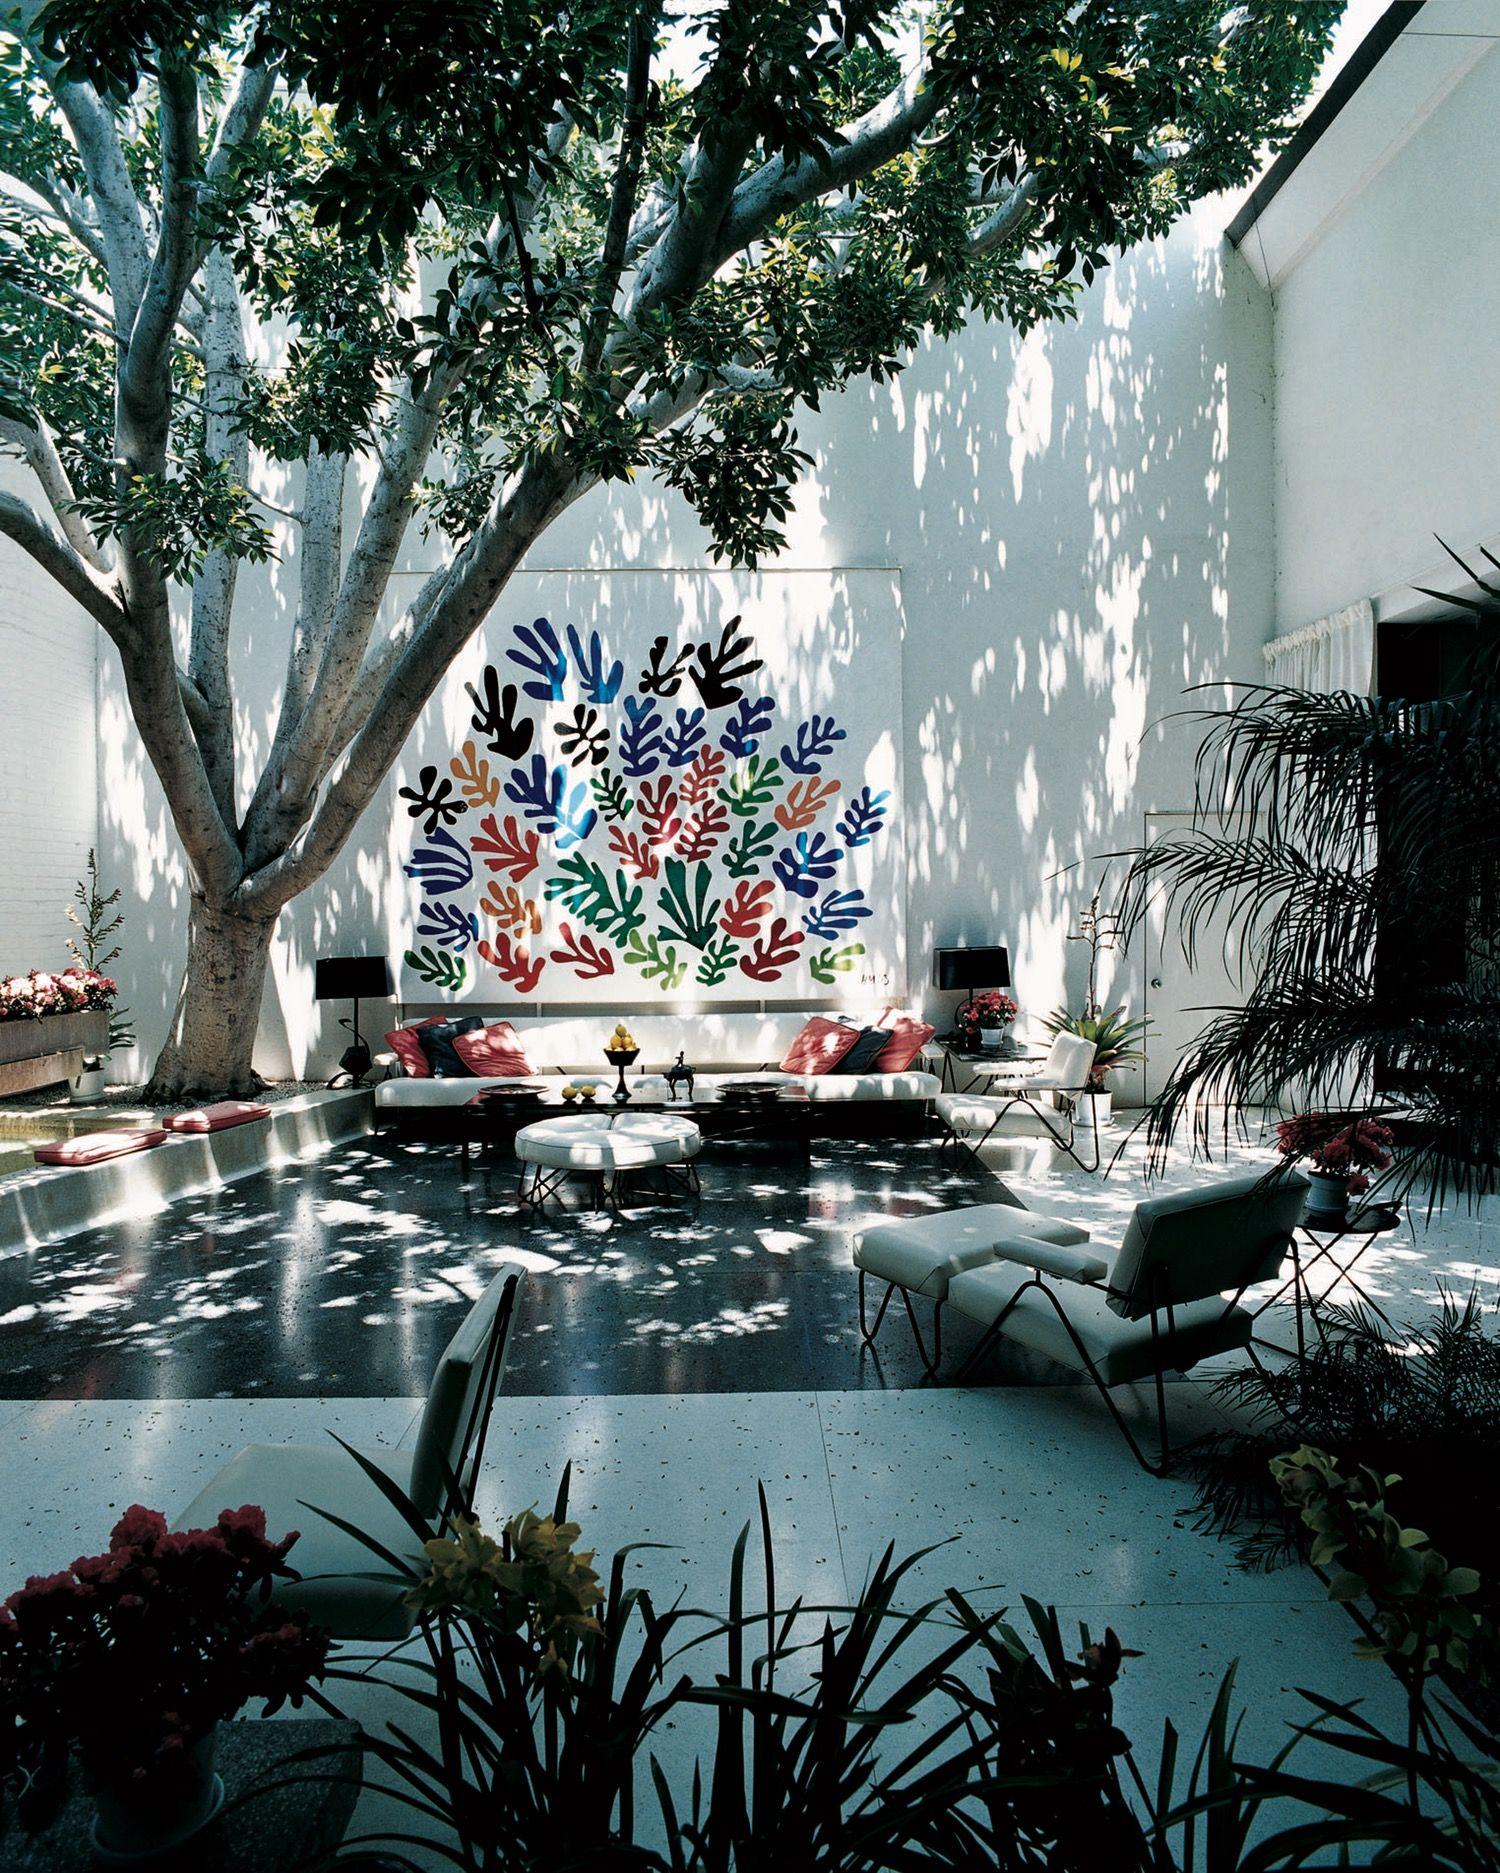 Wohnzimmerfliesen an der wand the finest rooms in america decor inspiration from thomas jayne